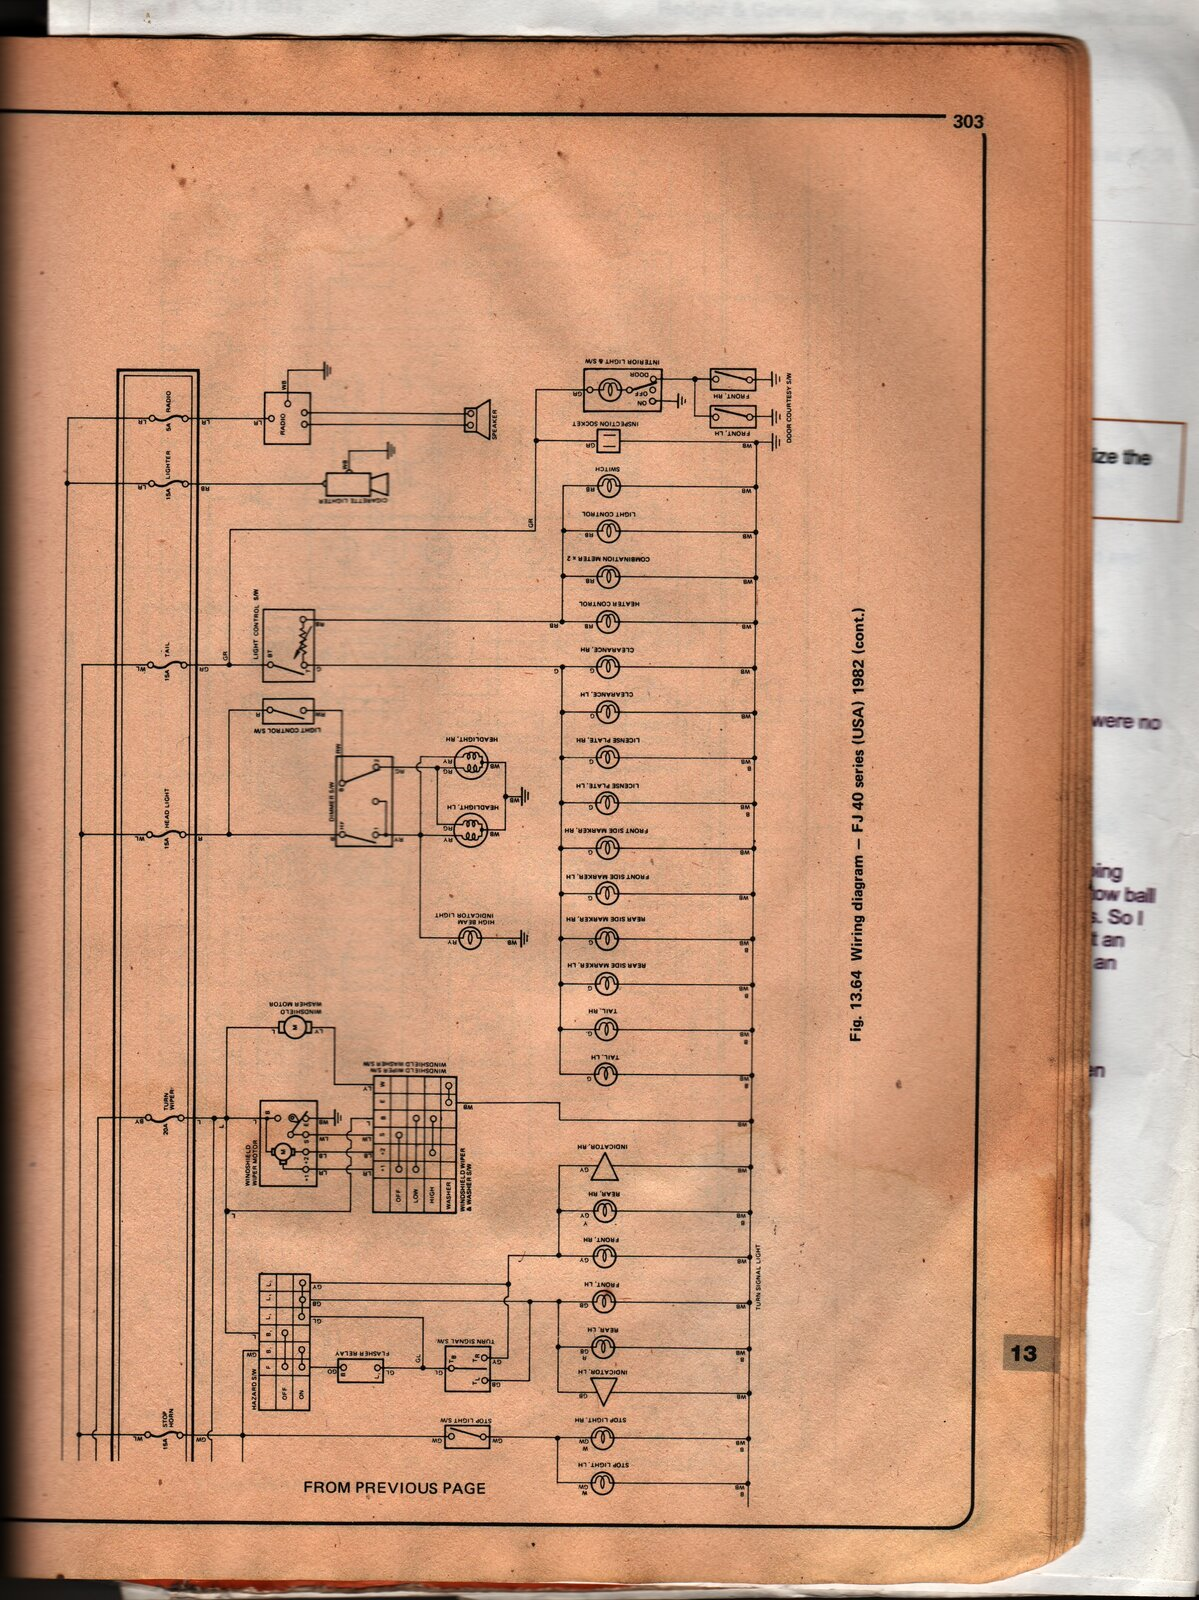 fj45 82 wiring dia p2.jpg